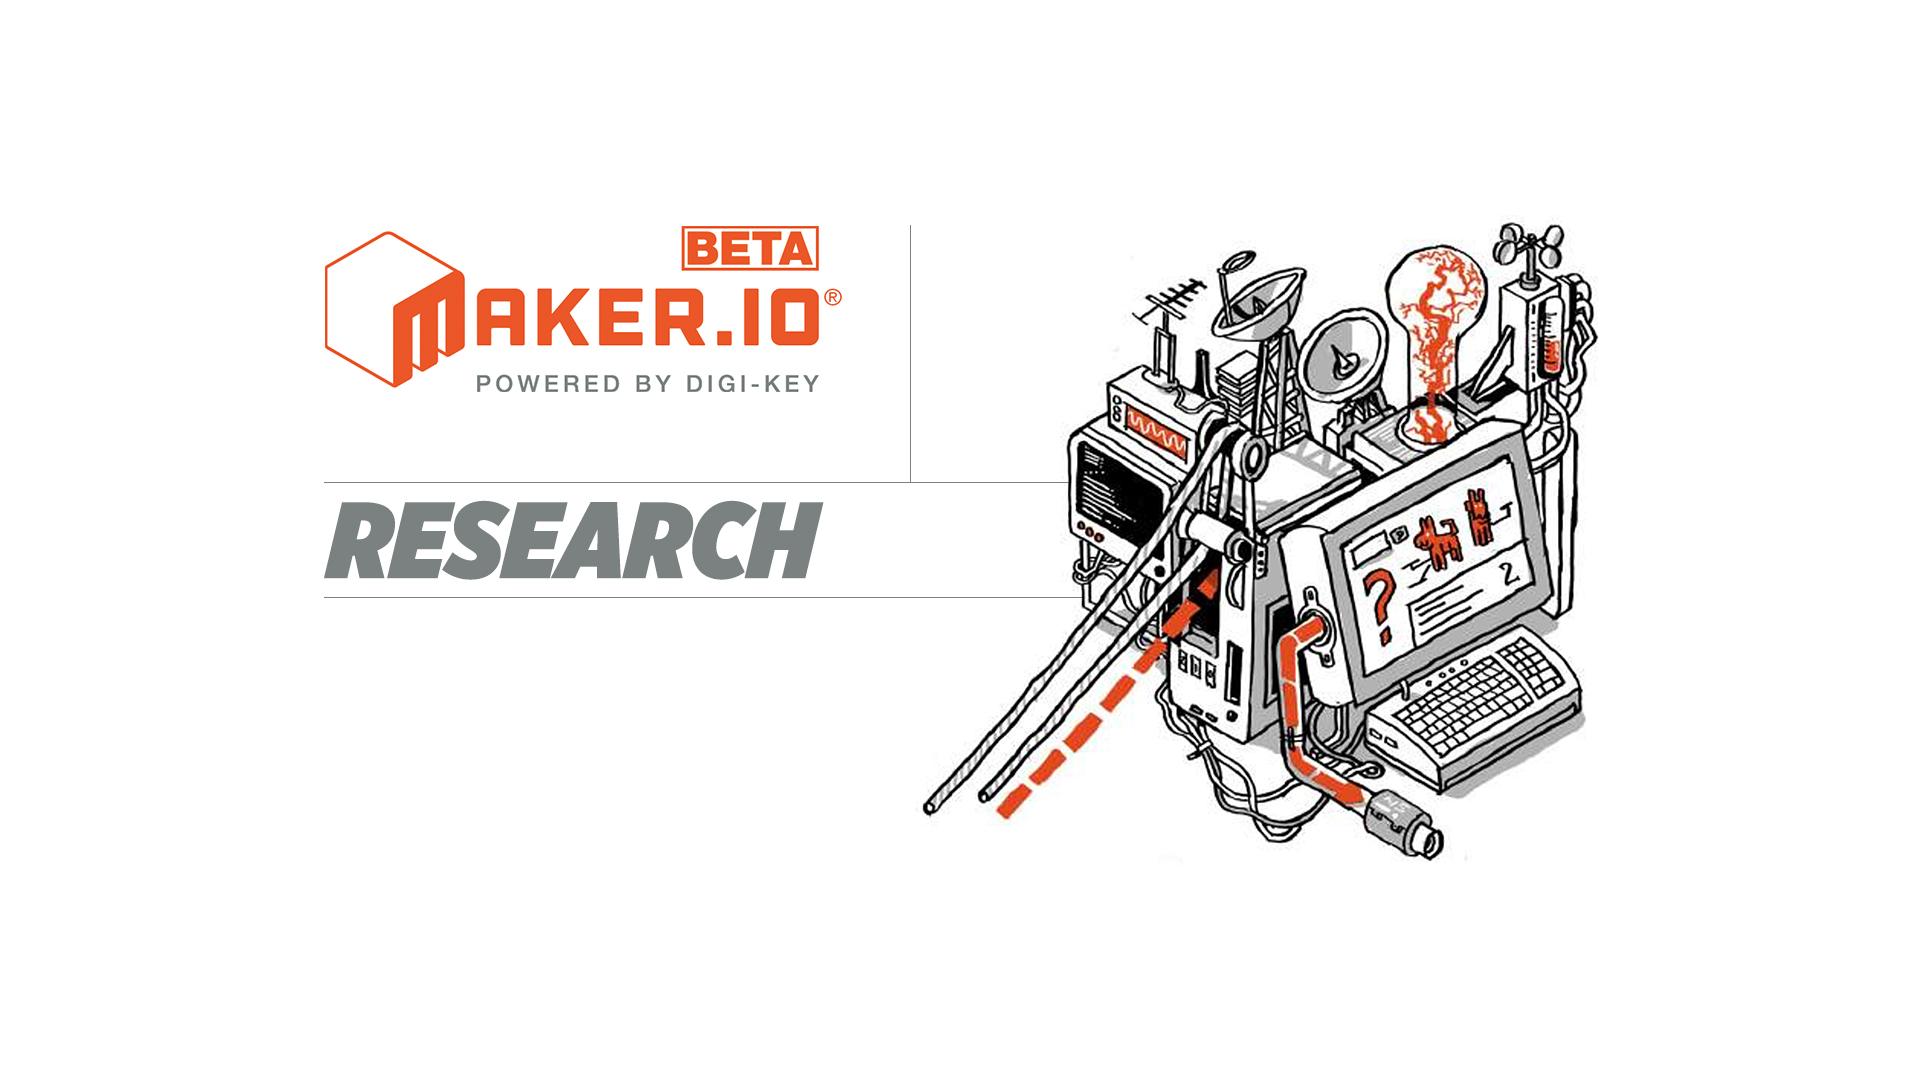 maker to market 2  u2013 research  u2013 how adafruit developed